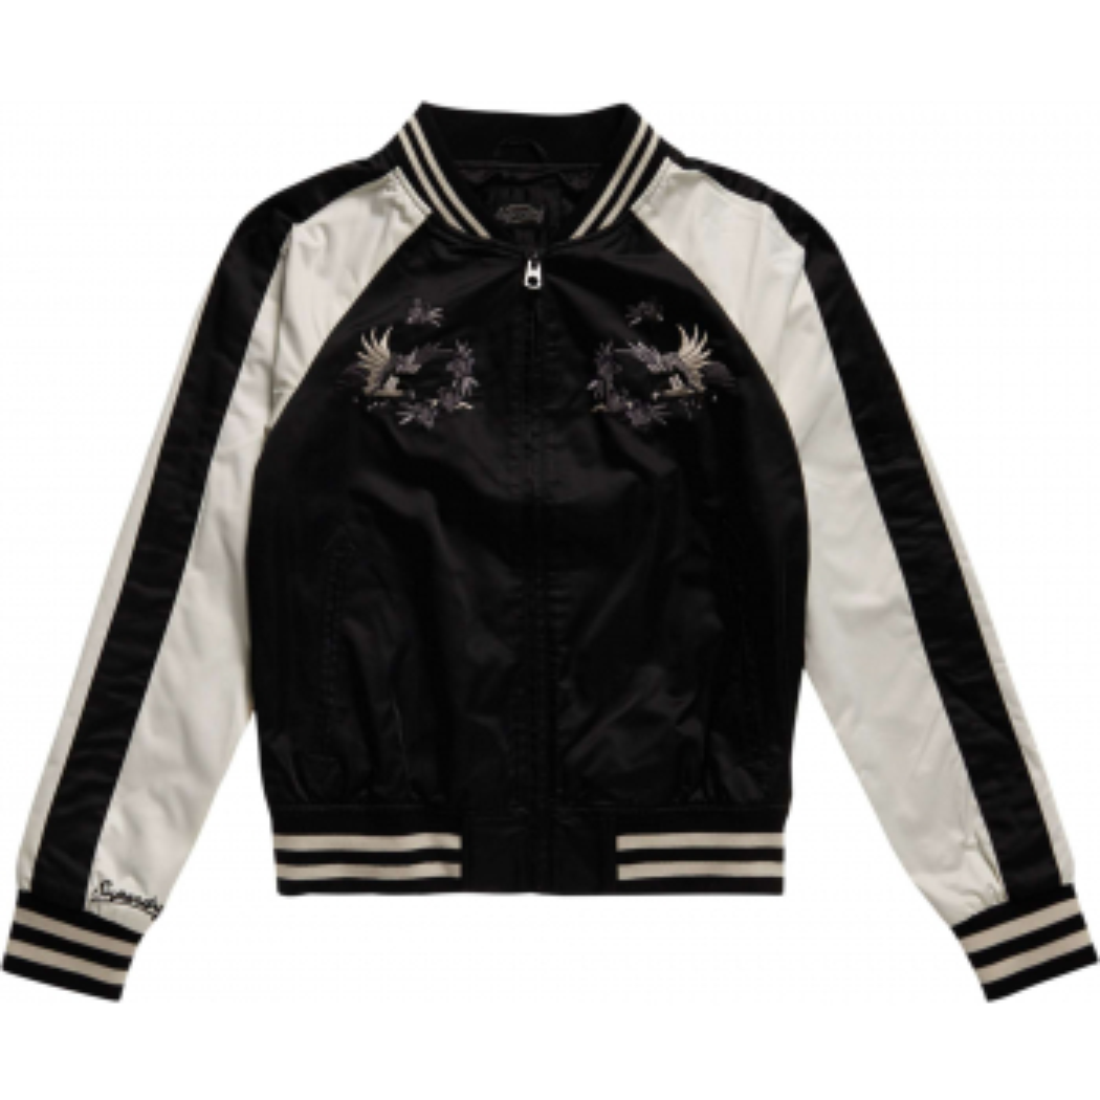 Suika bomber jacket satin black